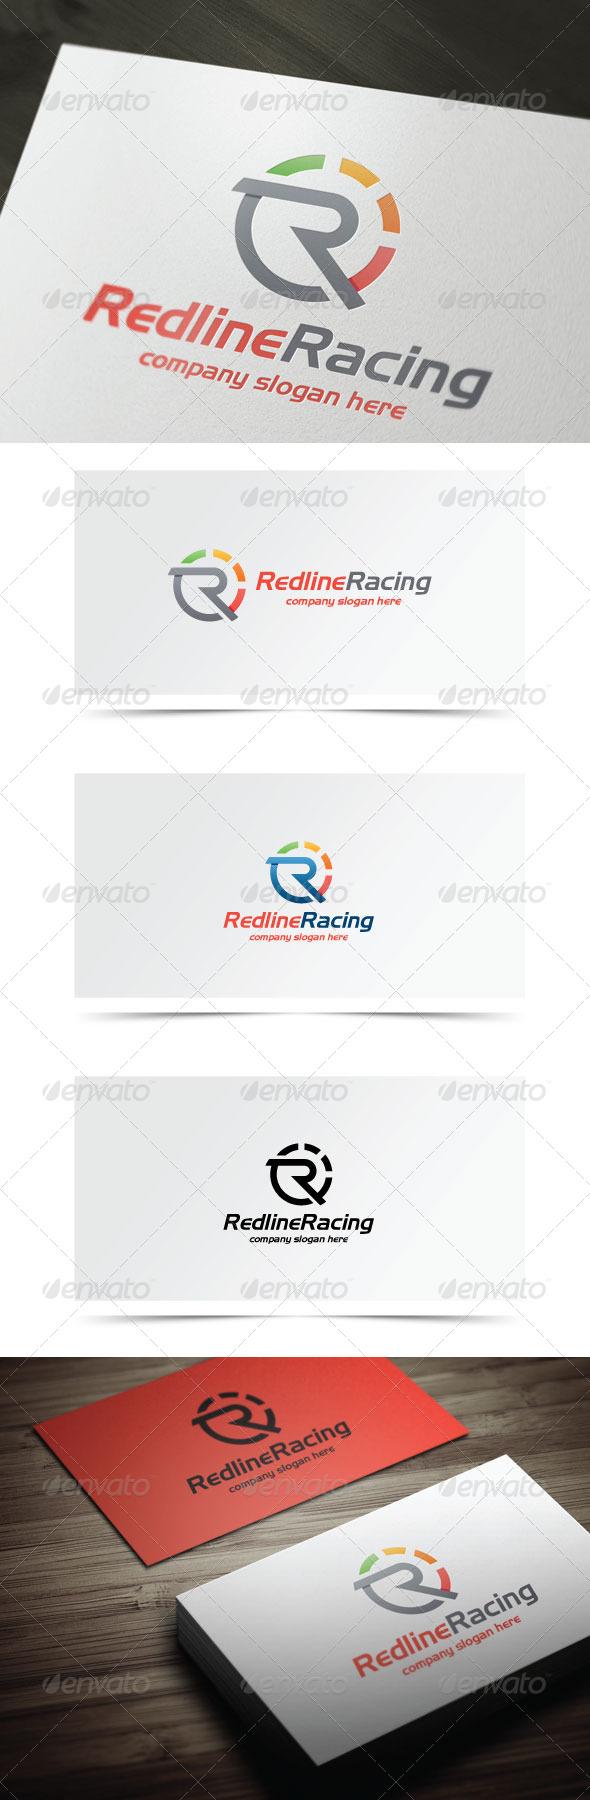 GraphicRiver Redline Racing 7827025